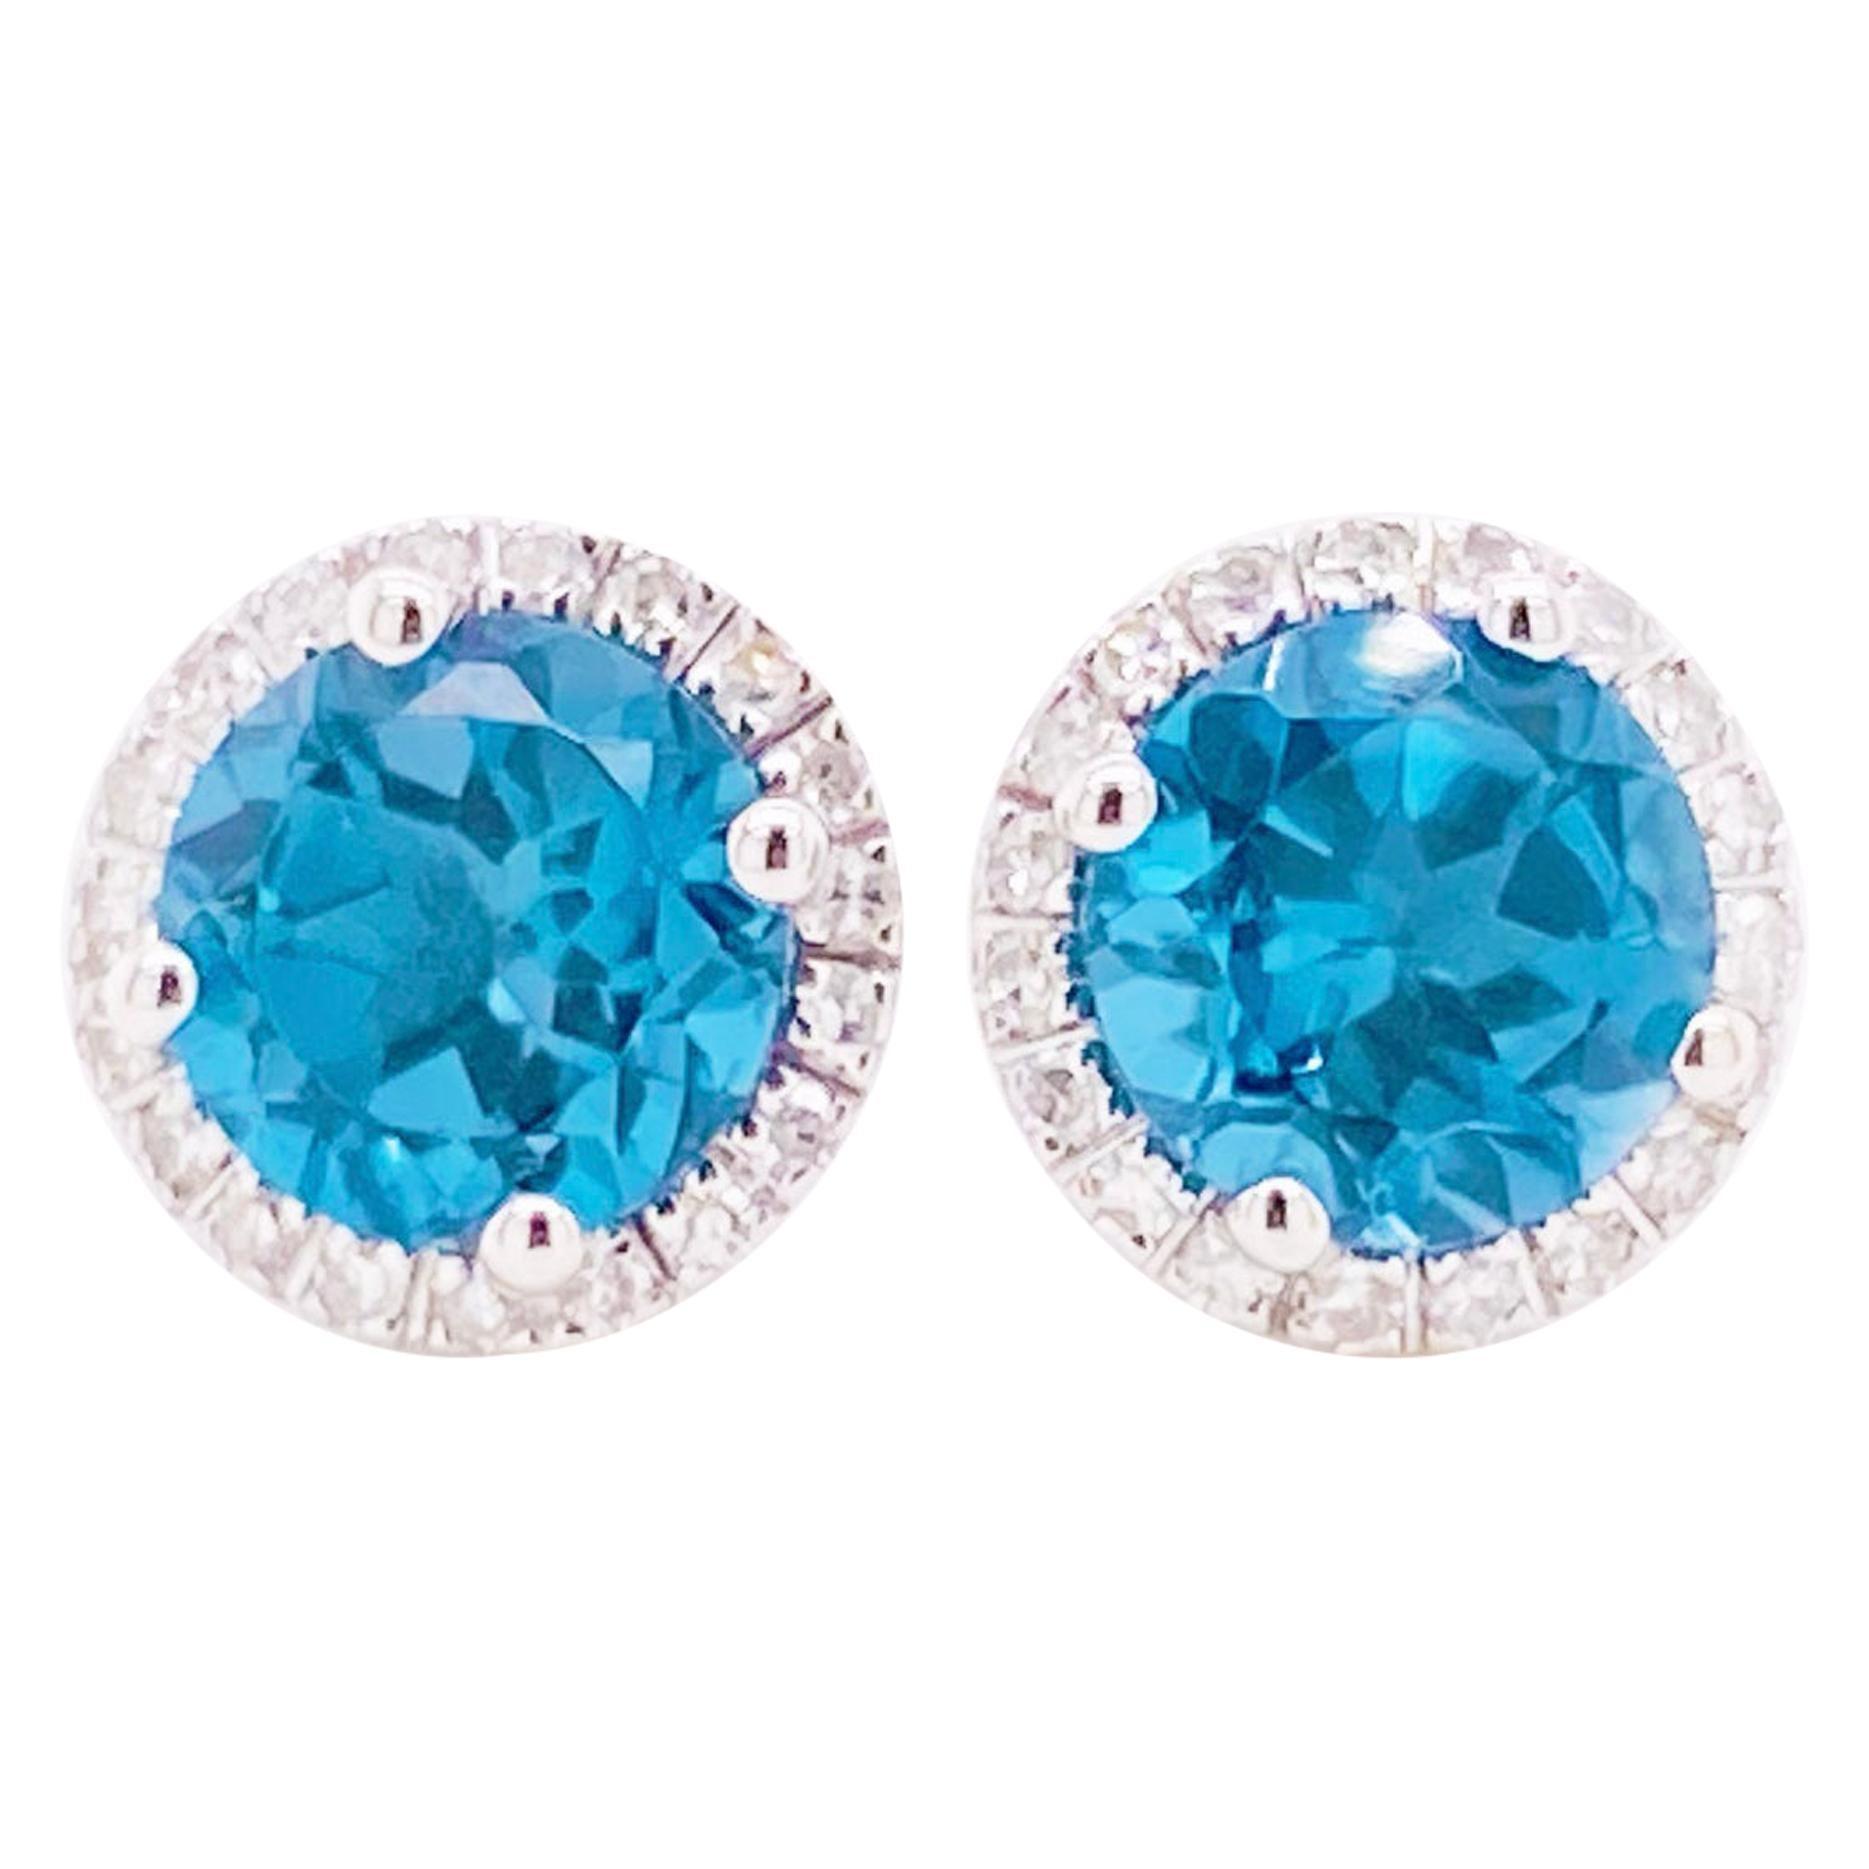 Diamond Topaz Earrings, London Blue Topaz Diamond Halo, 14K Gold 2 Carat Studs